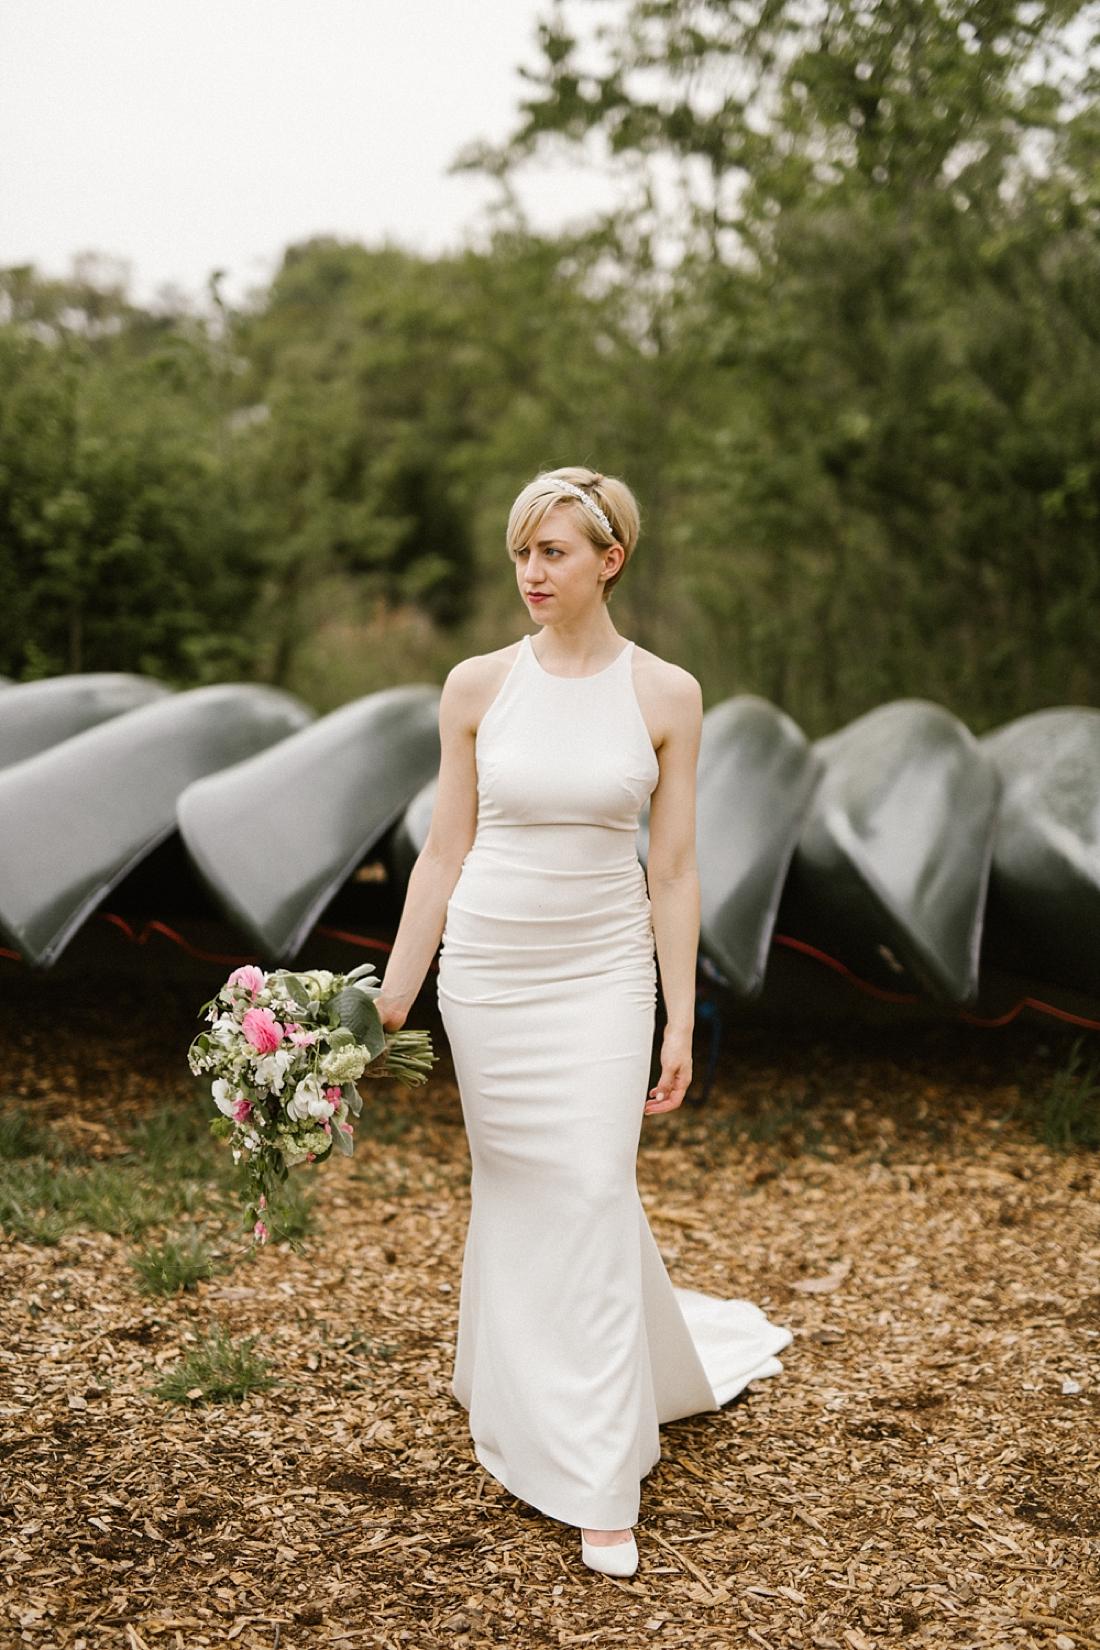 Marryland Weddings Earthy Neutrals Wedding at Chesapeake Bay Foundation Victoria Selman Photography_1027.jpg